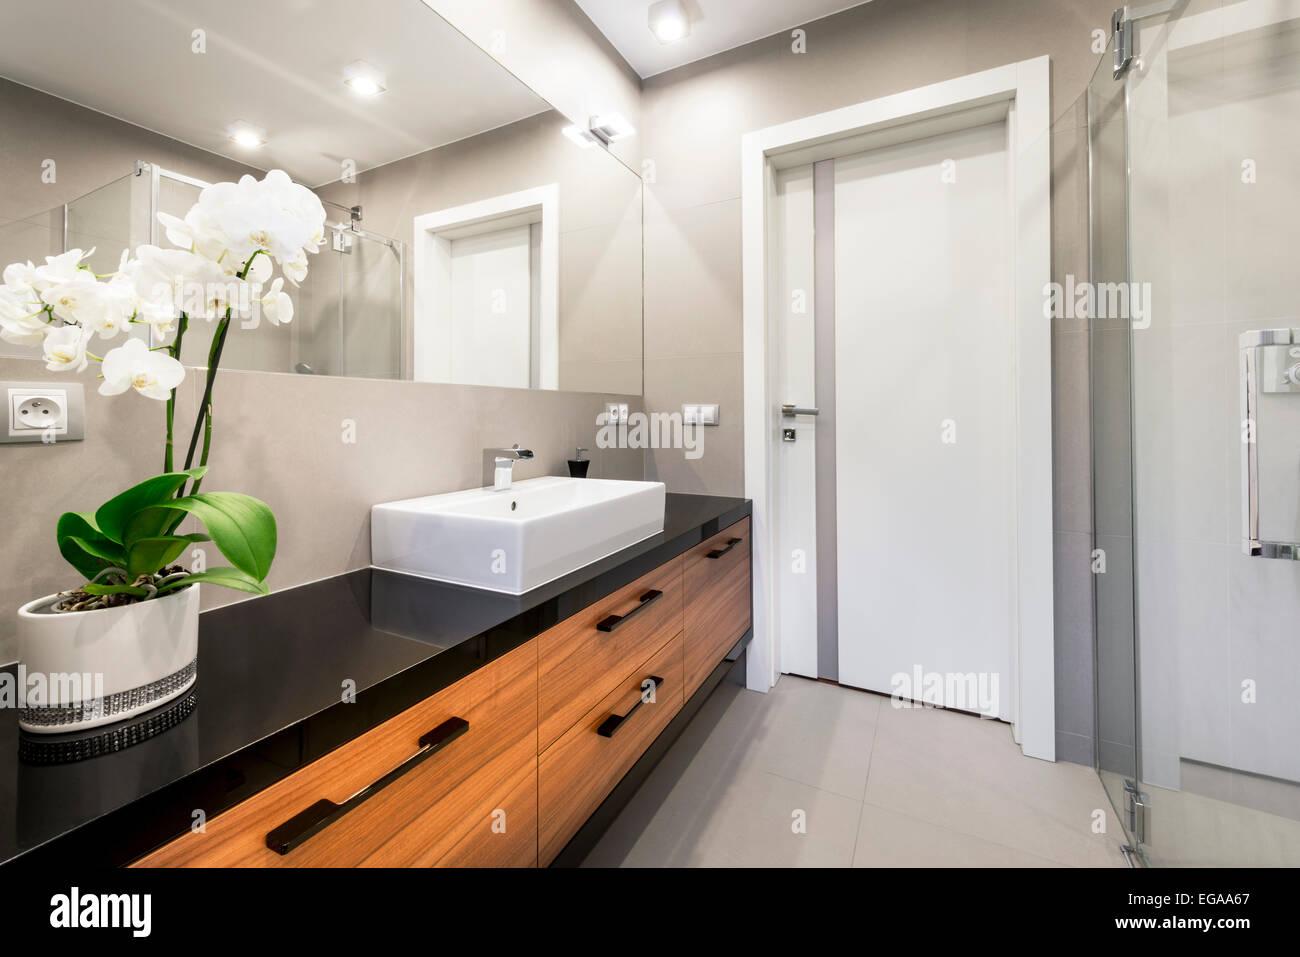 . Modern luxury bathroom interior design Stock Photo  78903503   Alamy